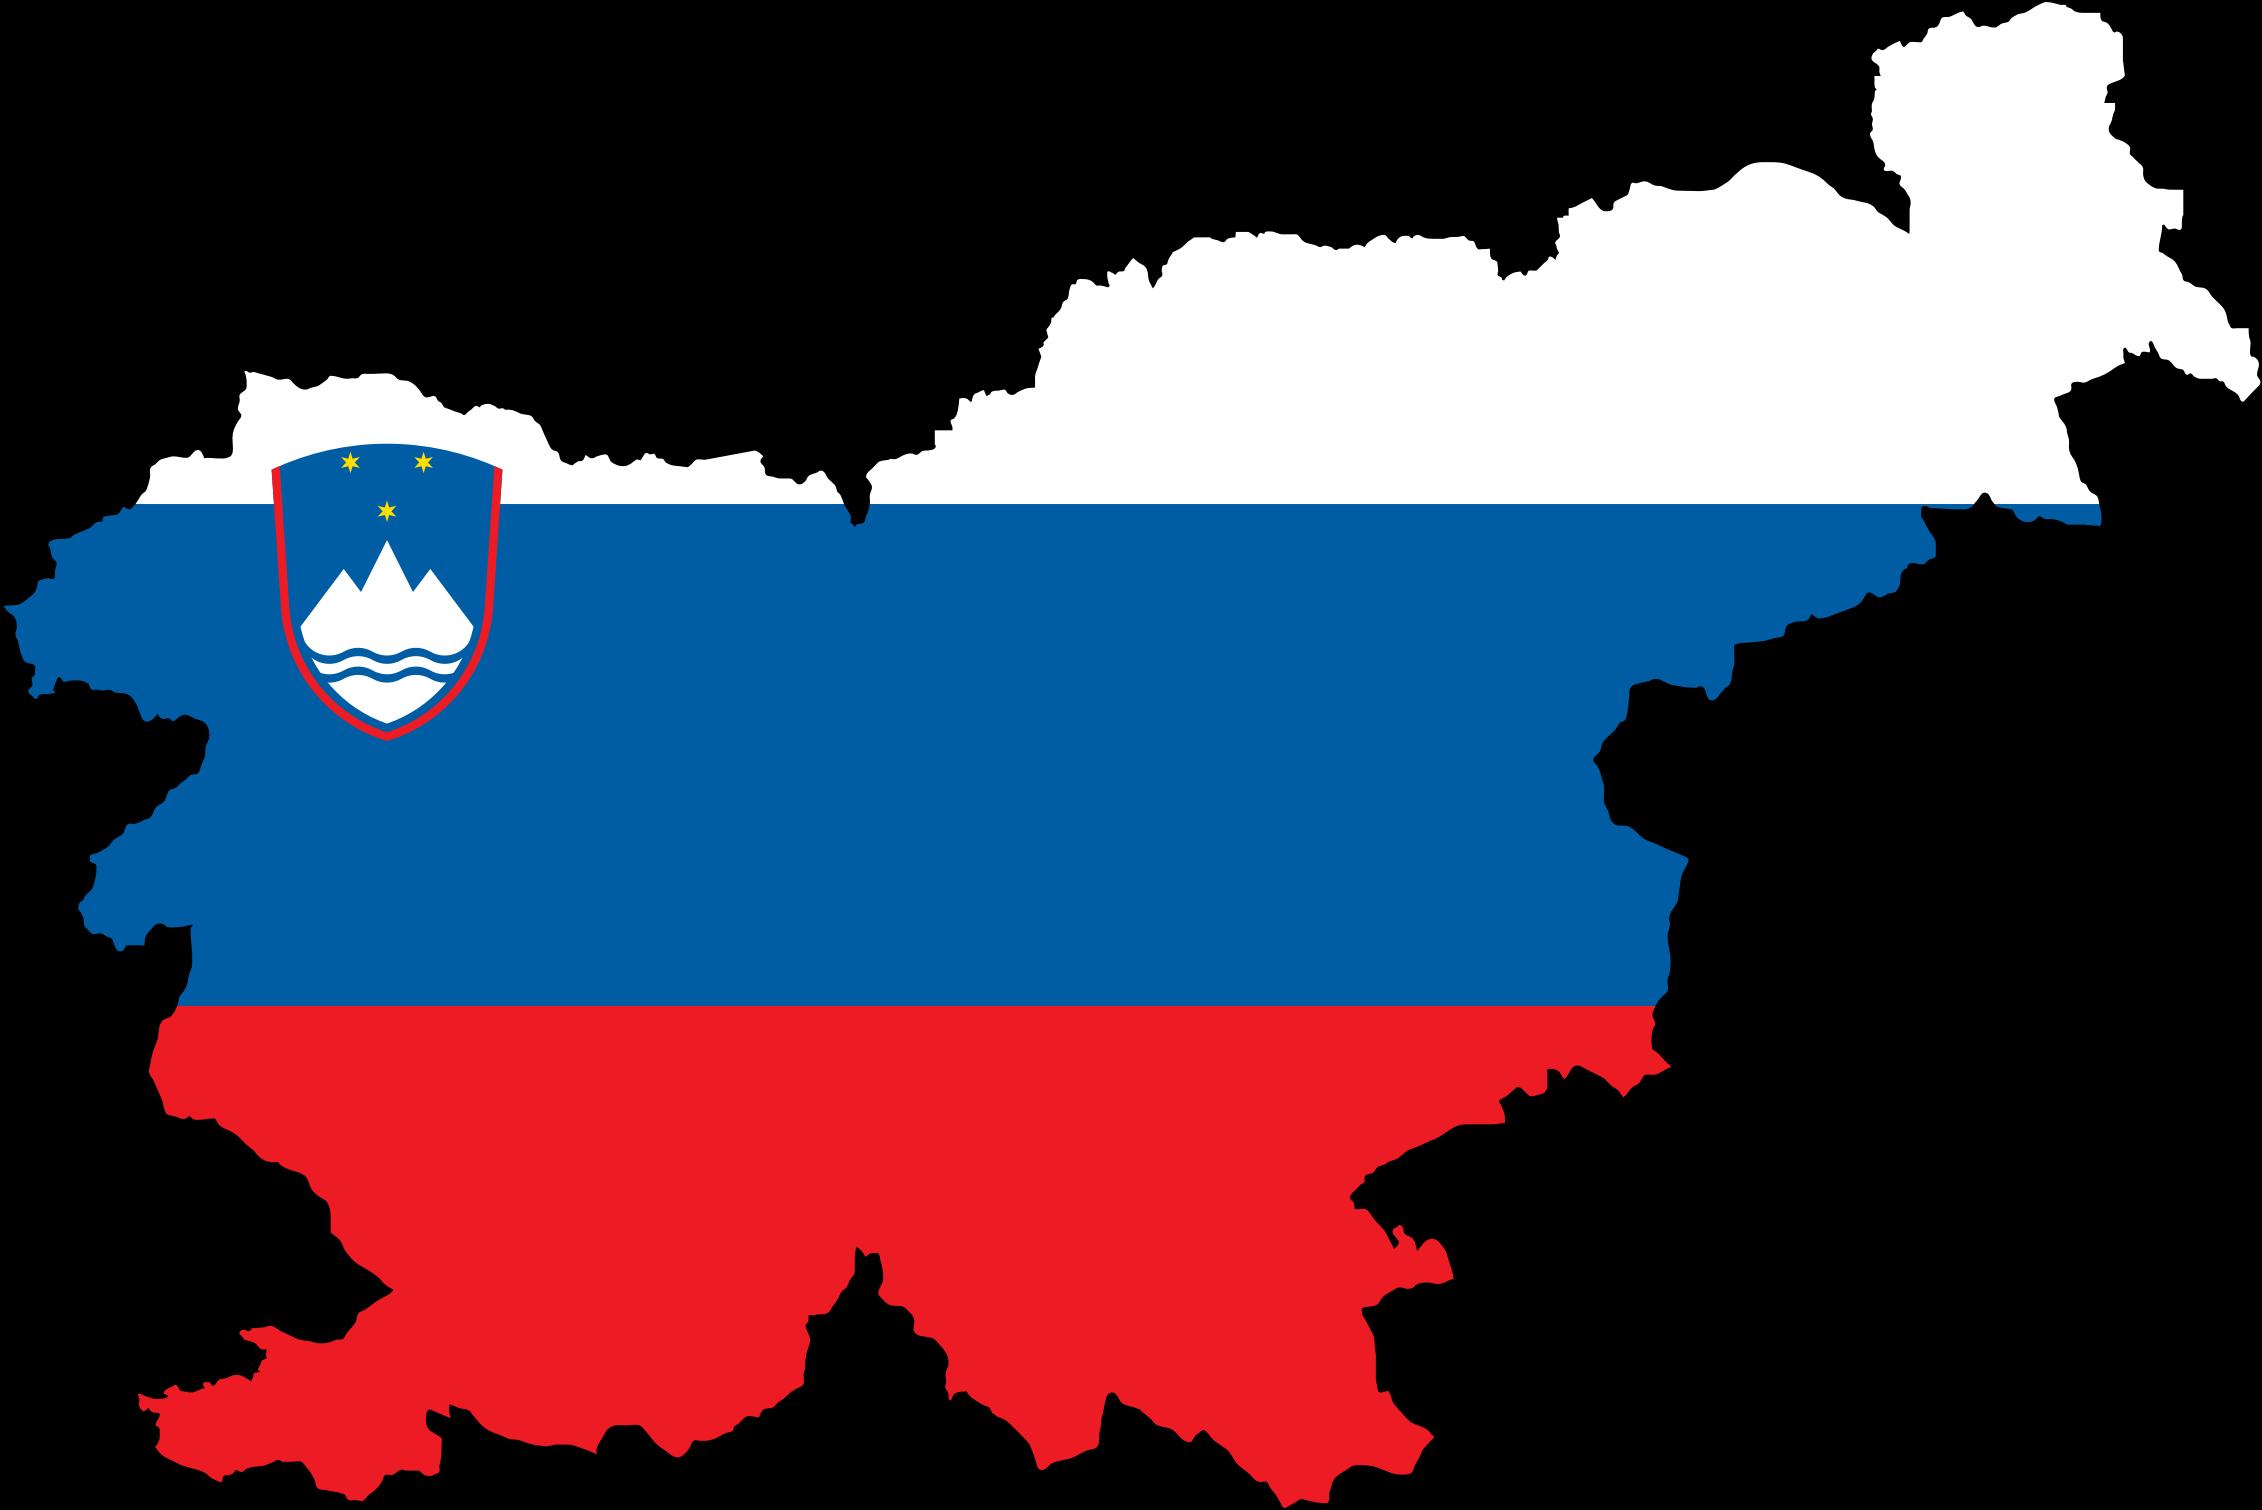 Flag clipart race track Stroke Slovenia With Flag Map